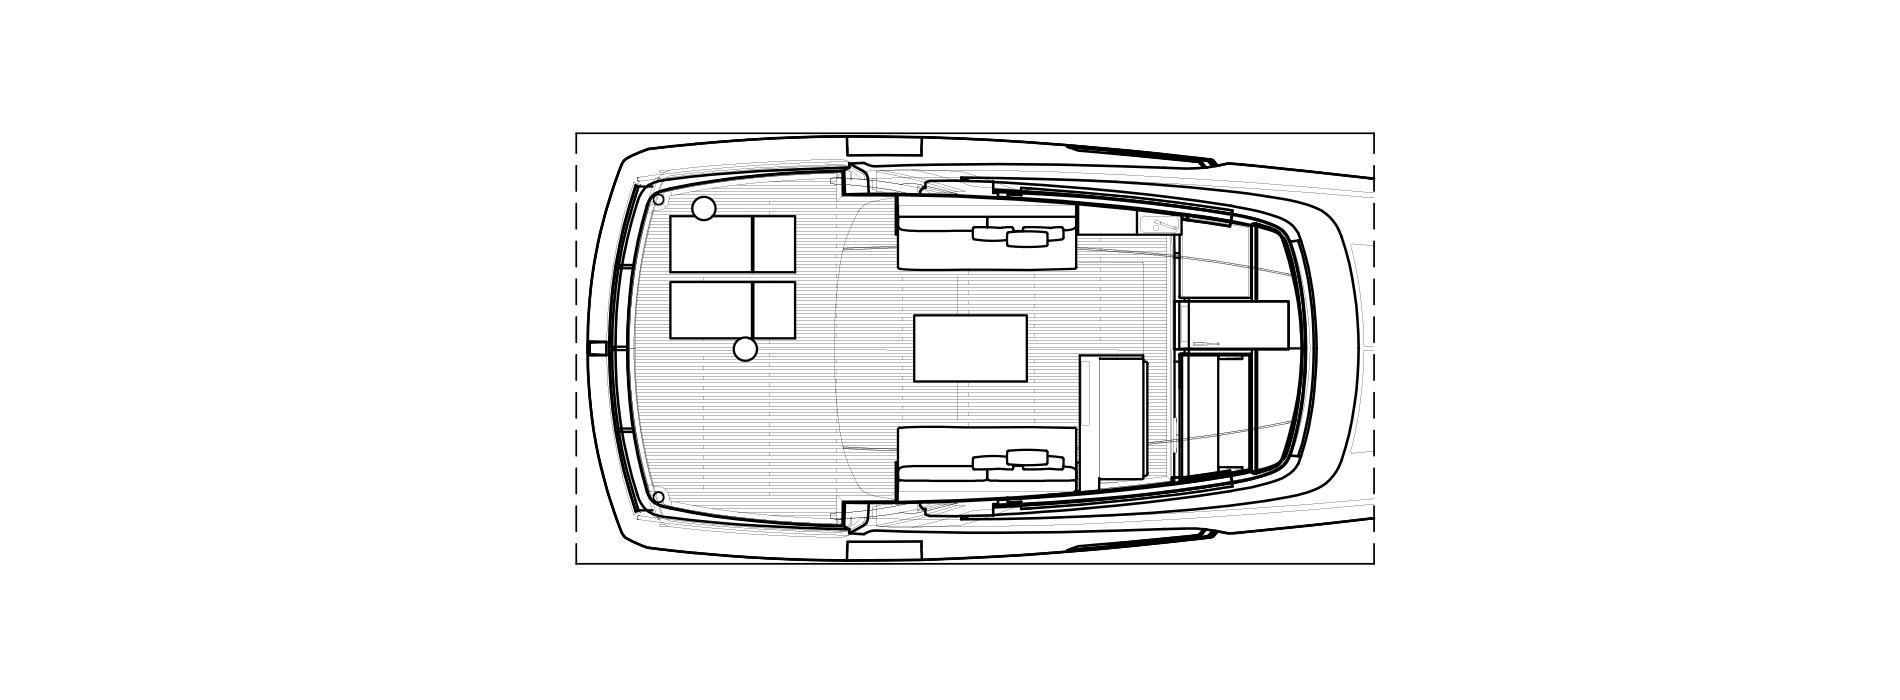 Sanlorenzo Yachts SX88 细节 Versione Lissoni